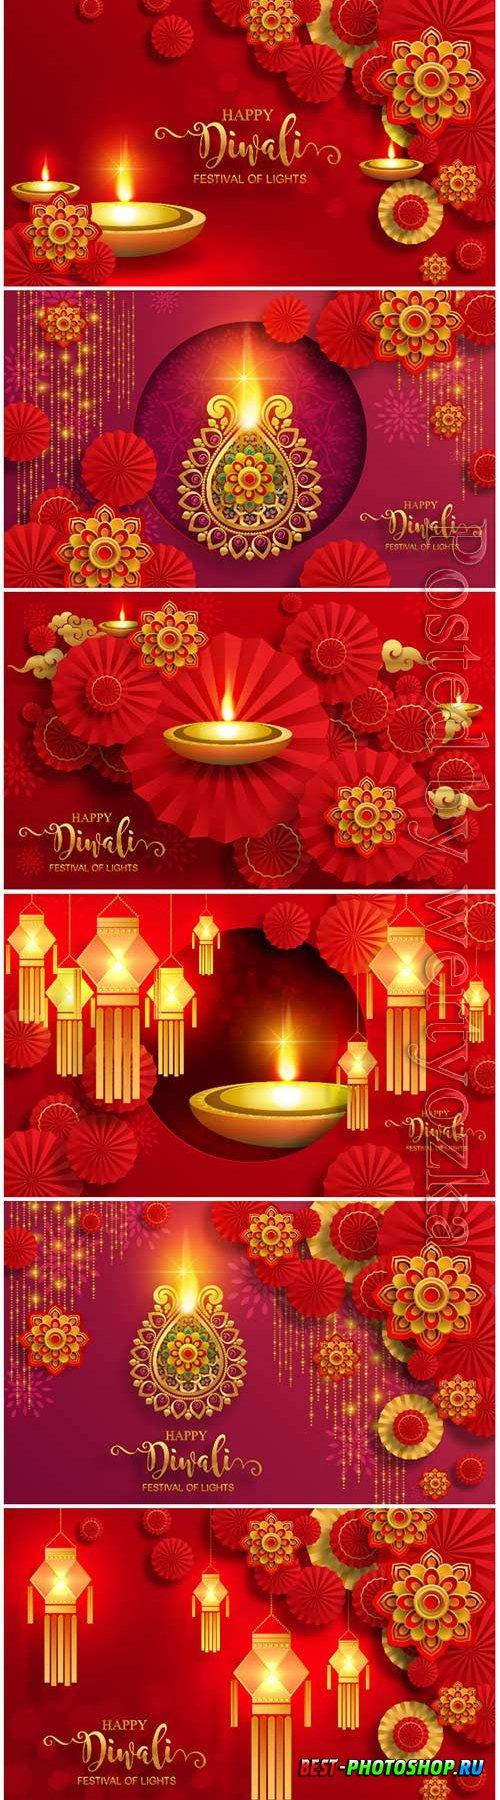 Diwali, deepavali or dipavali the festival of lights india with gold diya vector patterned